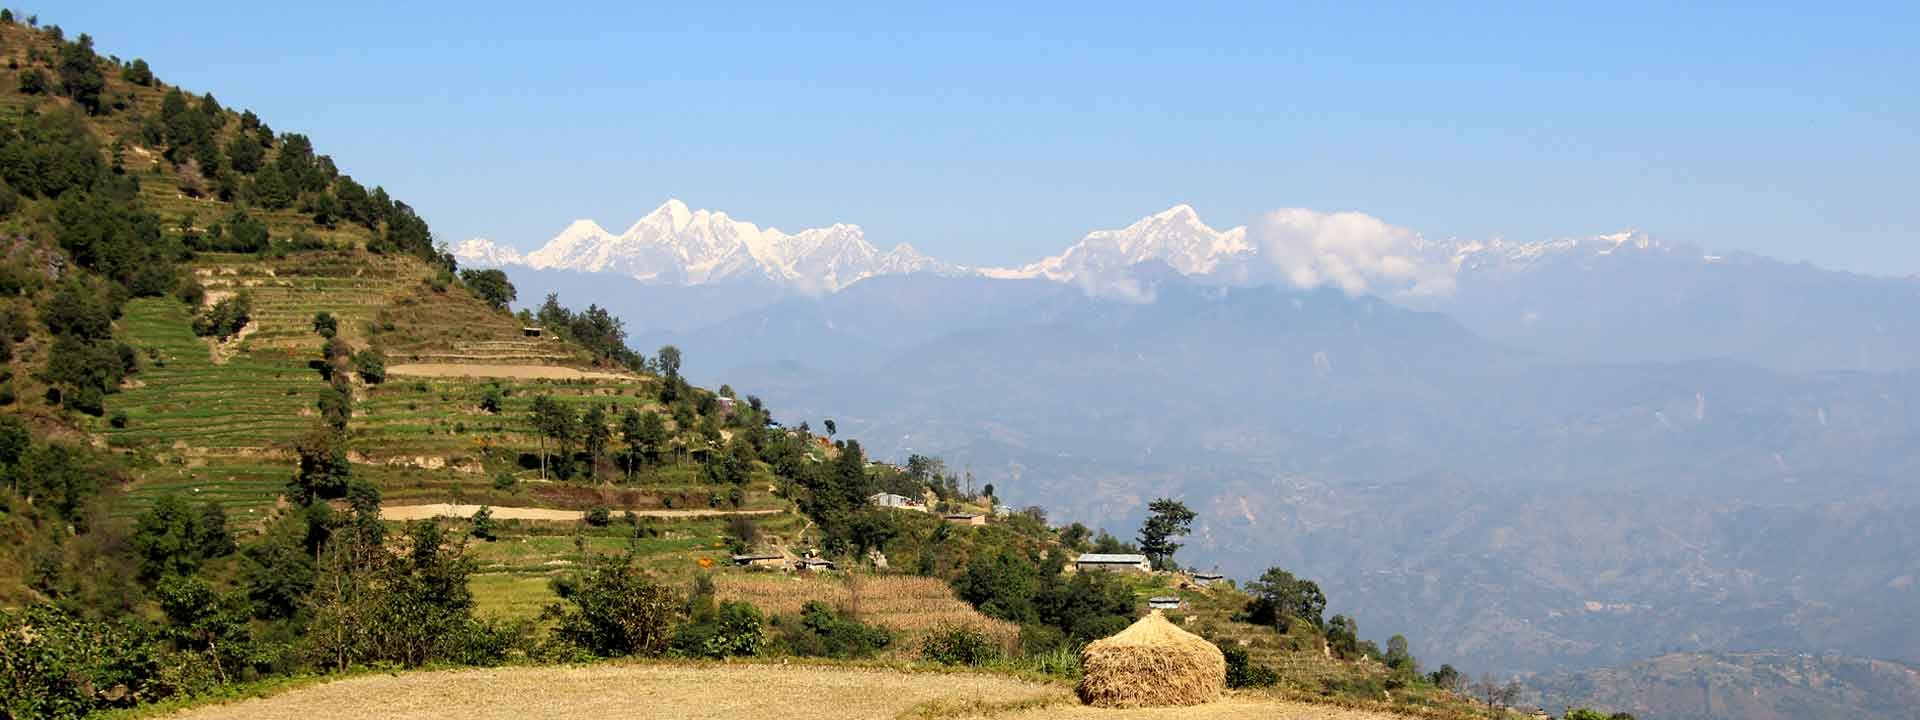 Chisapani Nagarkot Hiking